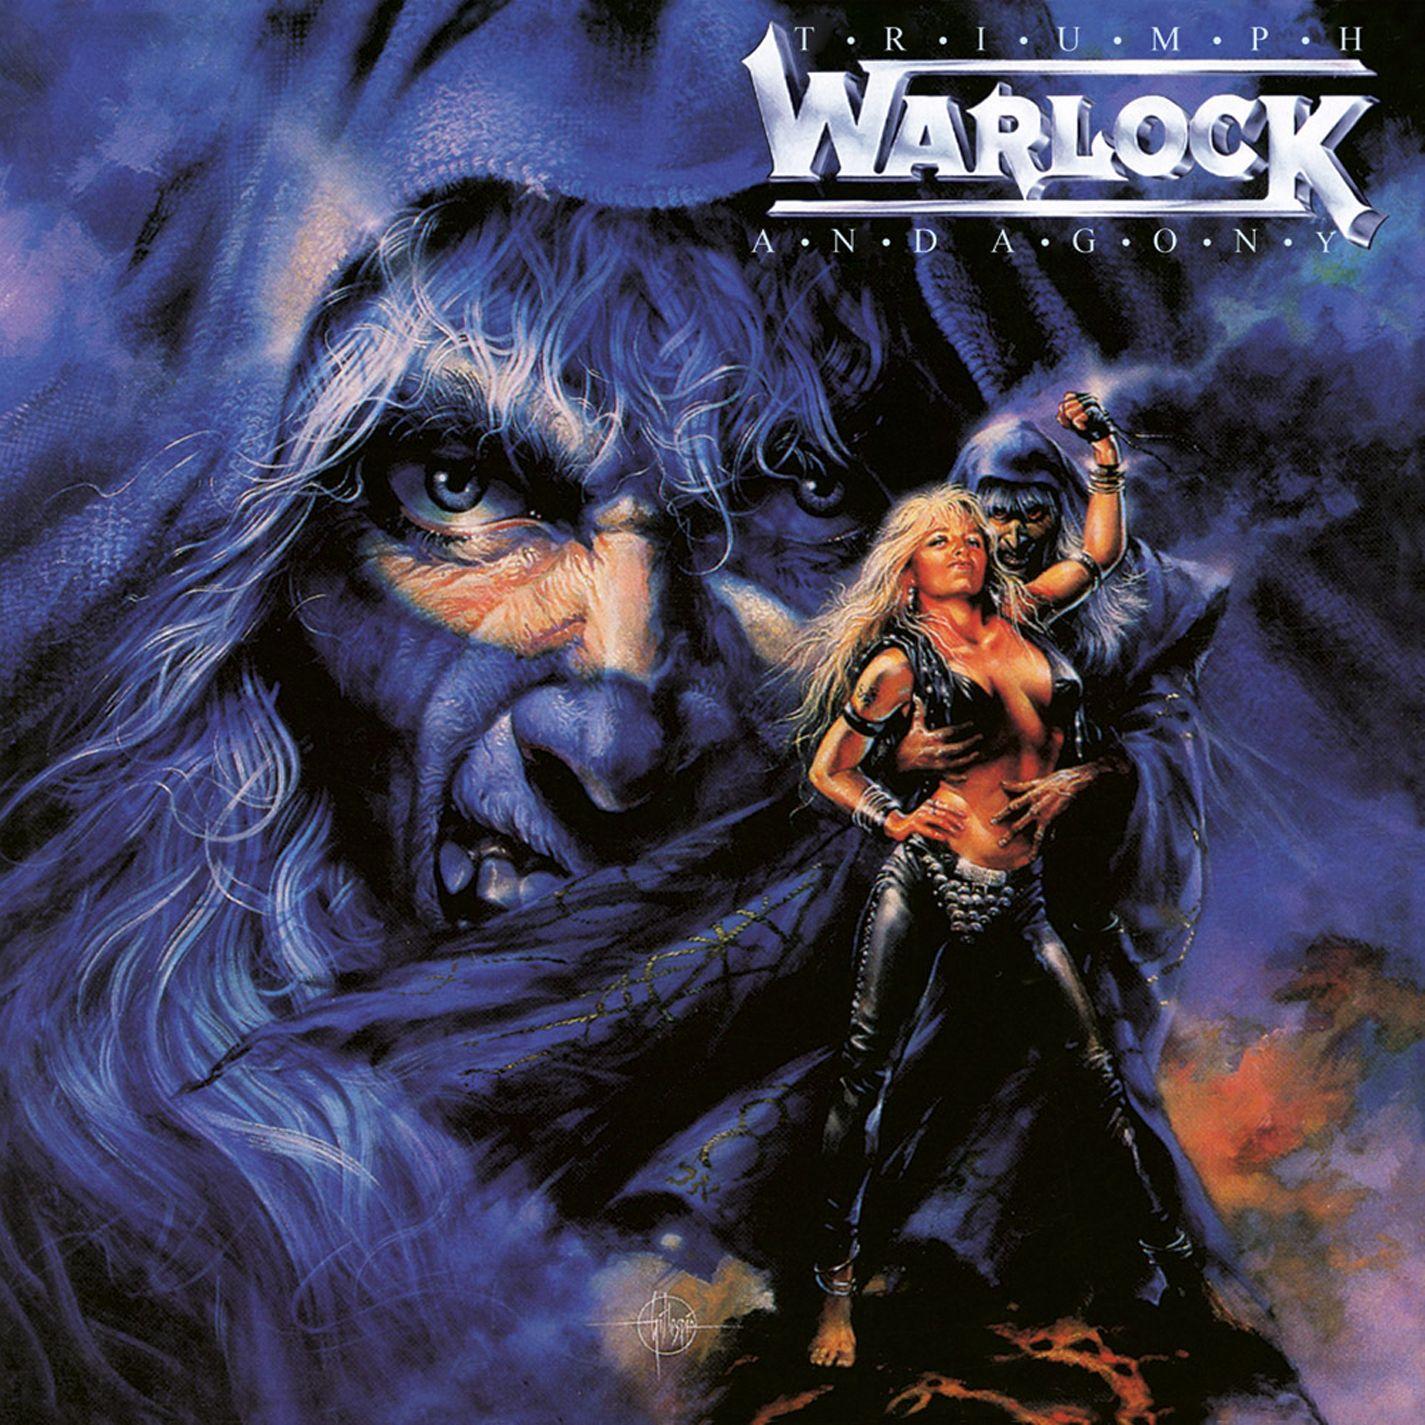 warlock triumph and agony heavy metal album covers